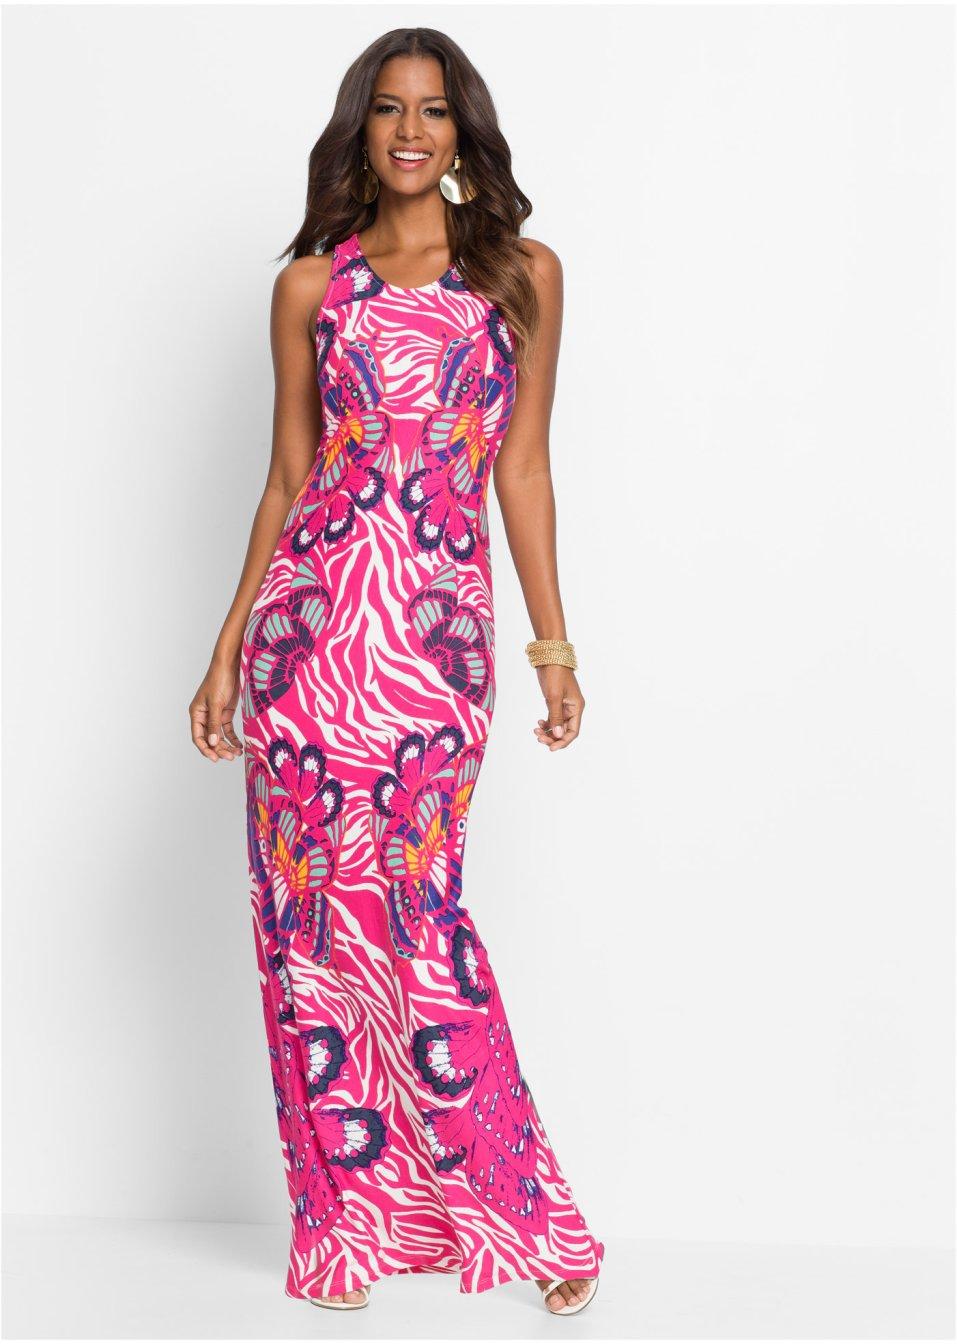 Kleid bunt rosa - Damen - bonprix.de